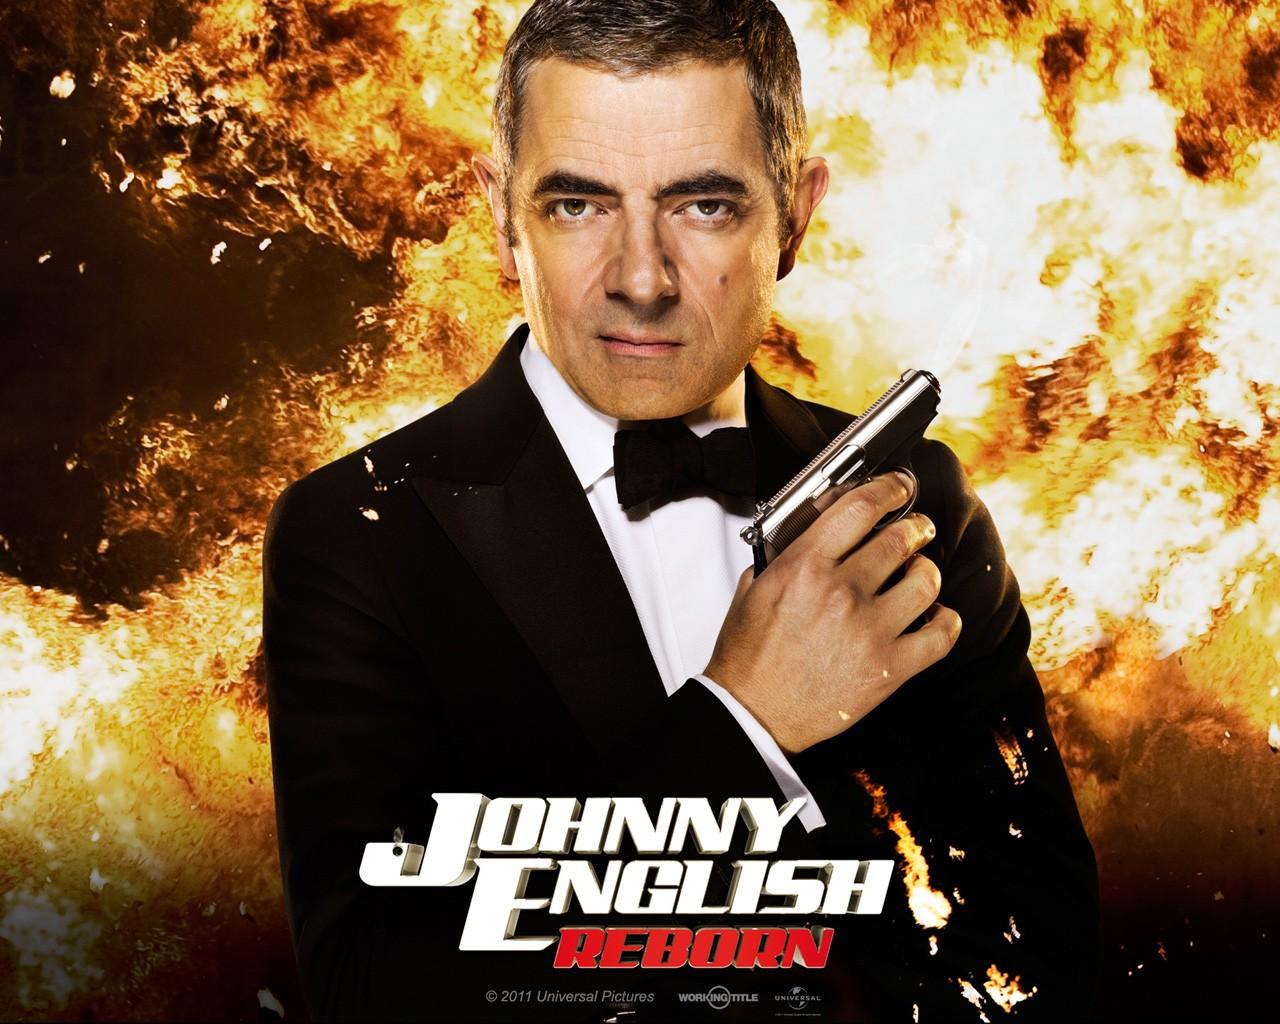 johnny english reborn ndash - photo #5